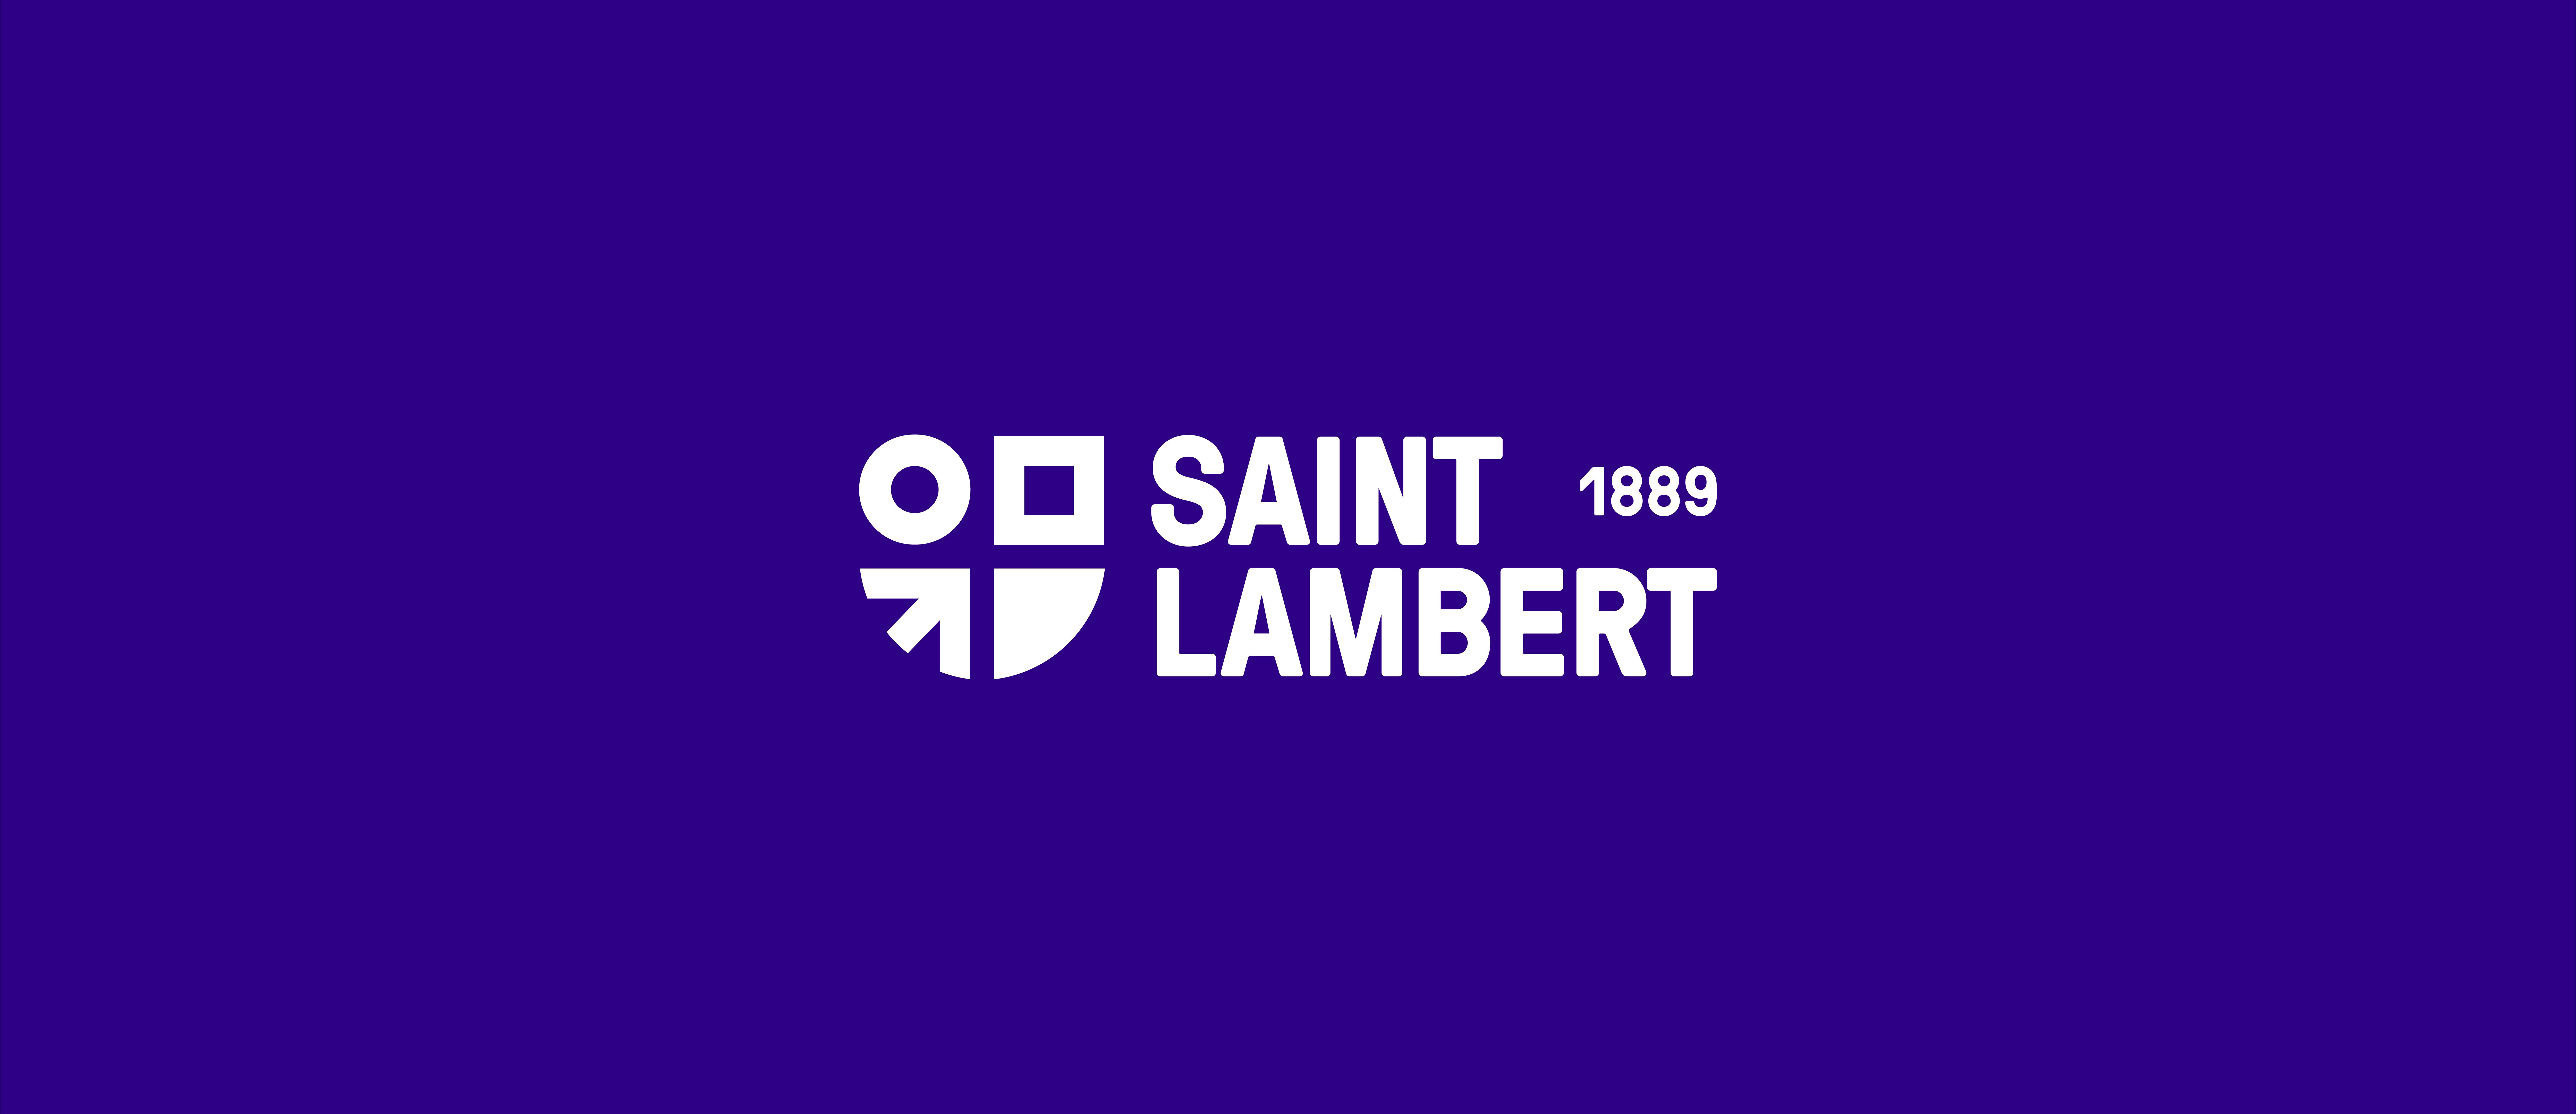 FFB – SAINT LAMBERT